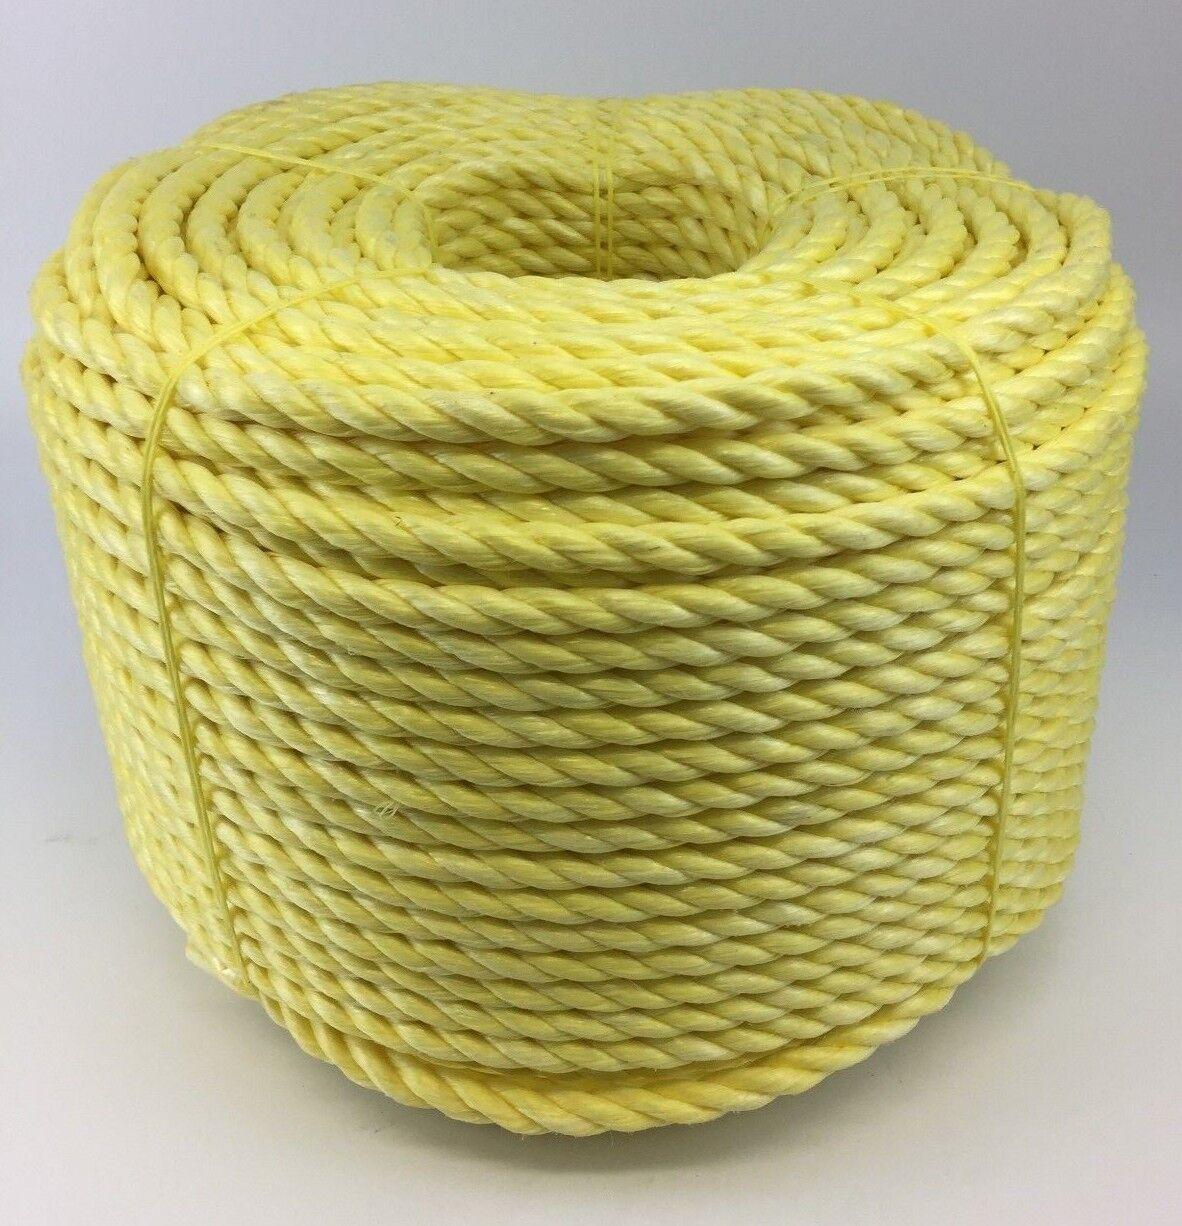 16mm gelb POLYPROPYLEN SEIL x 100 Meter, Poly-Seil Rollen, preiswert Nylon Seil